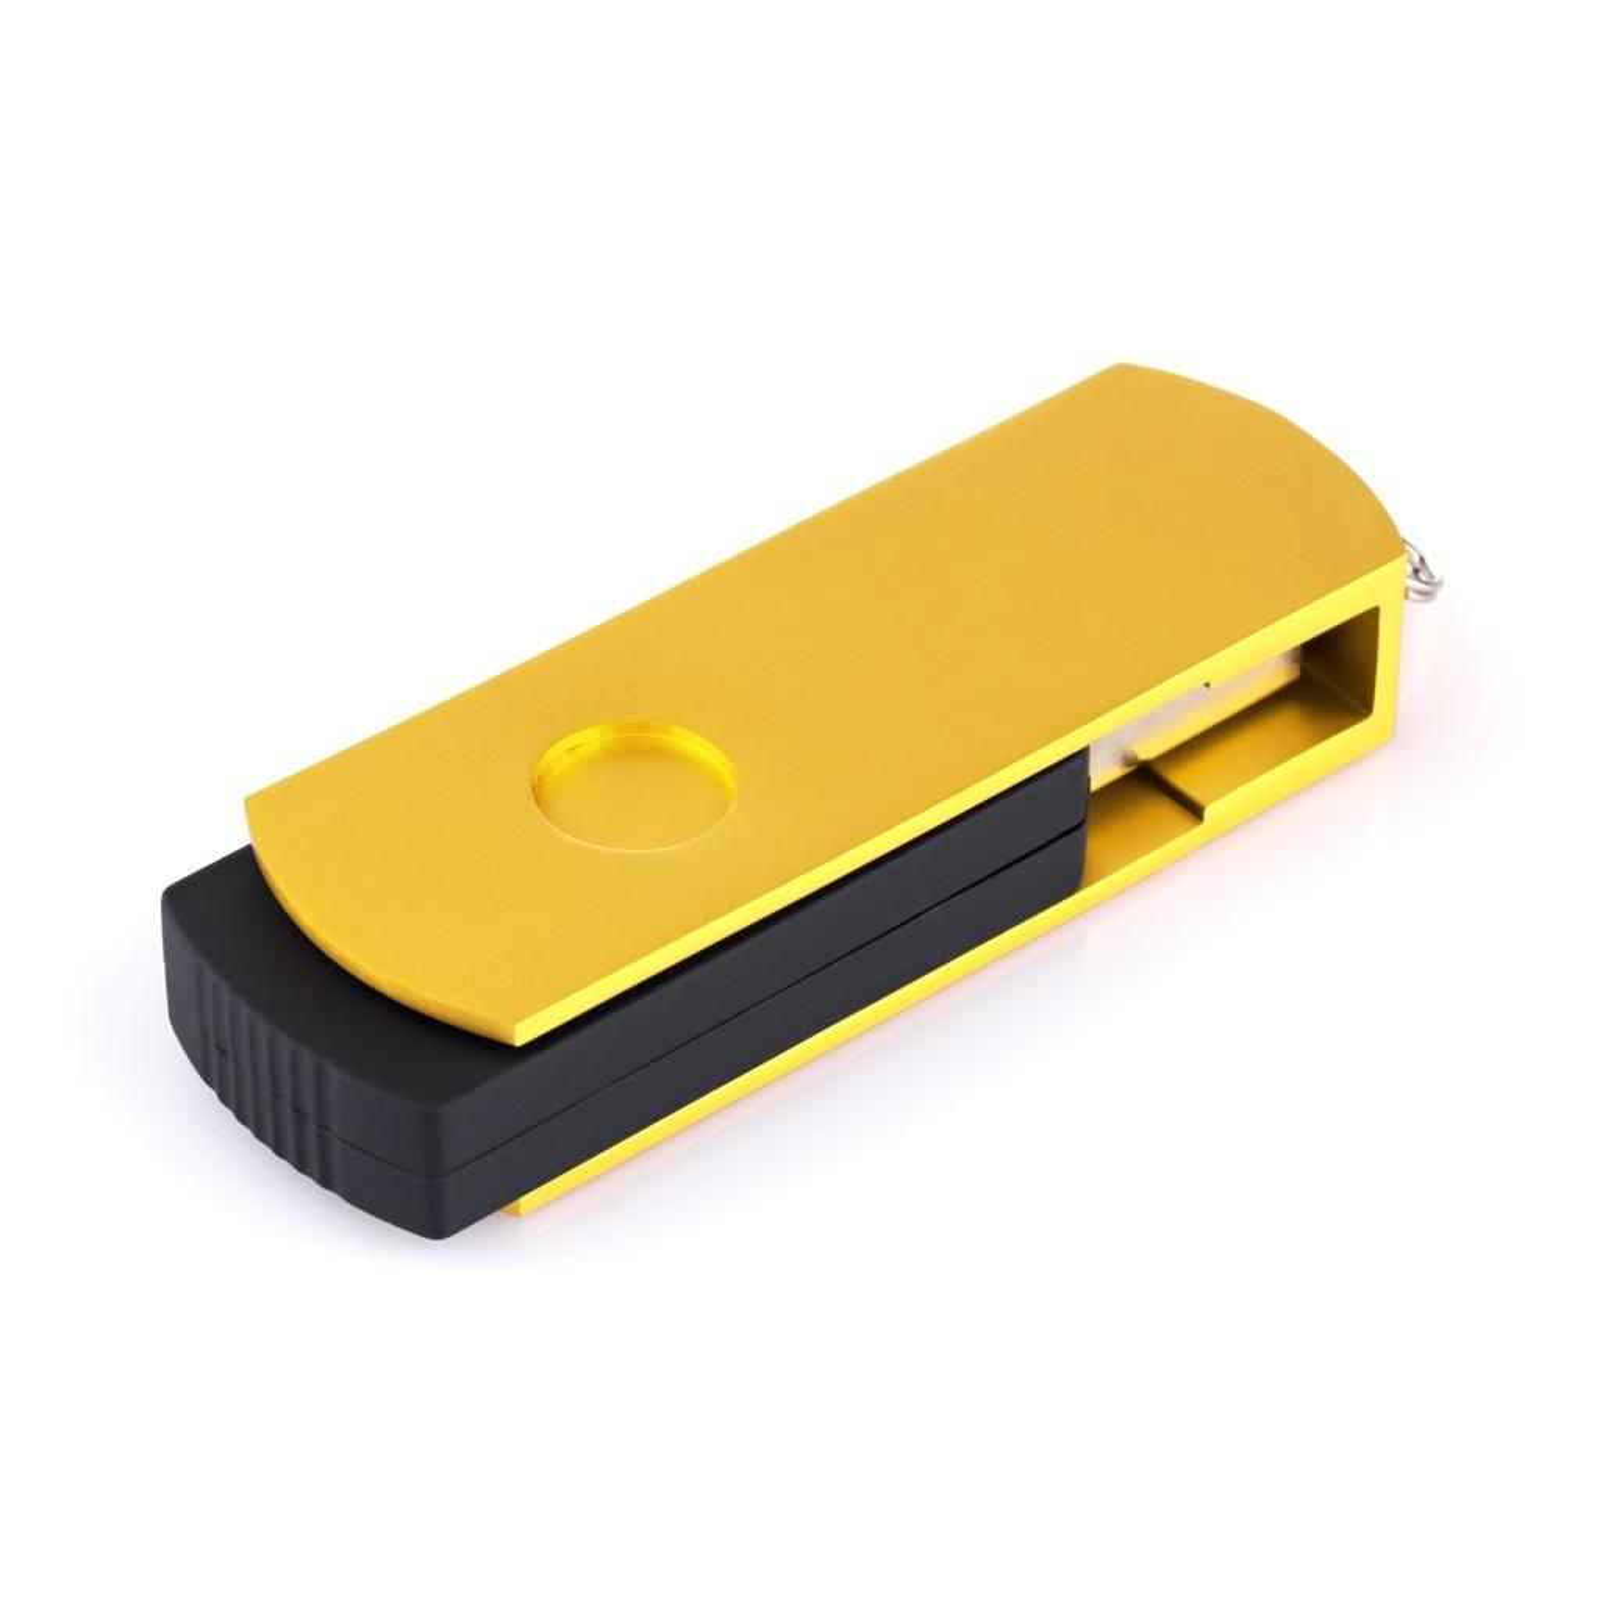 USB флеш накопитель eXceleram 128GB P2 Series Brown/Black USB 3.1 Gen 1 (EXP2U3BRB128) изображение 6